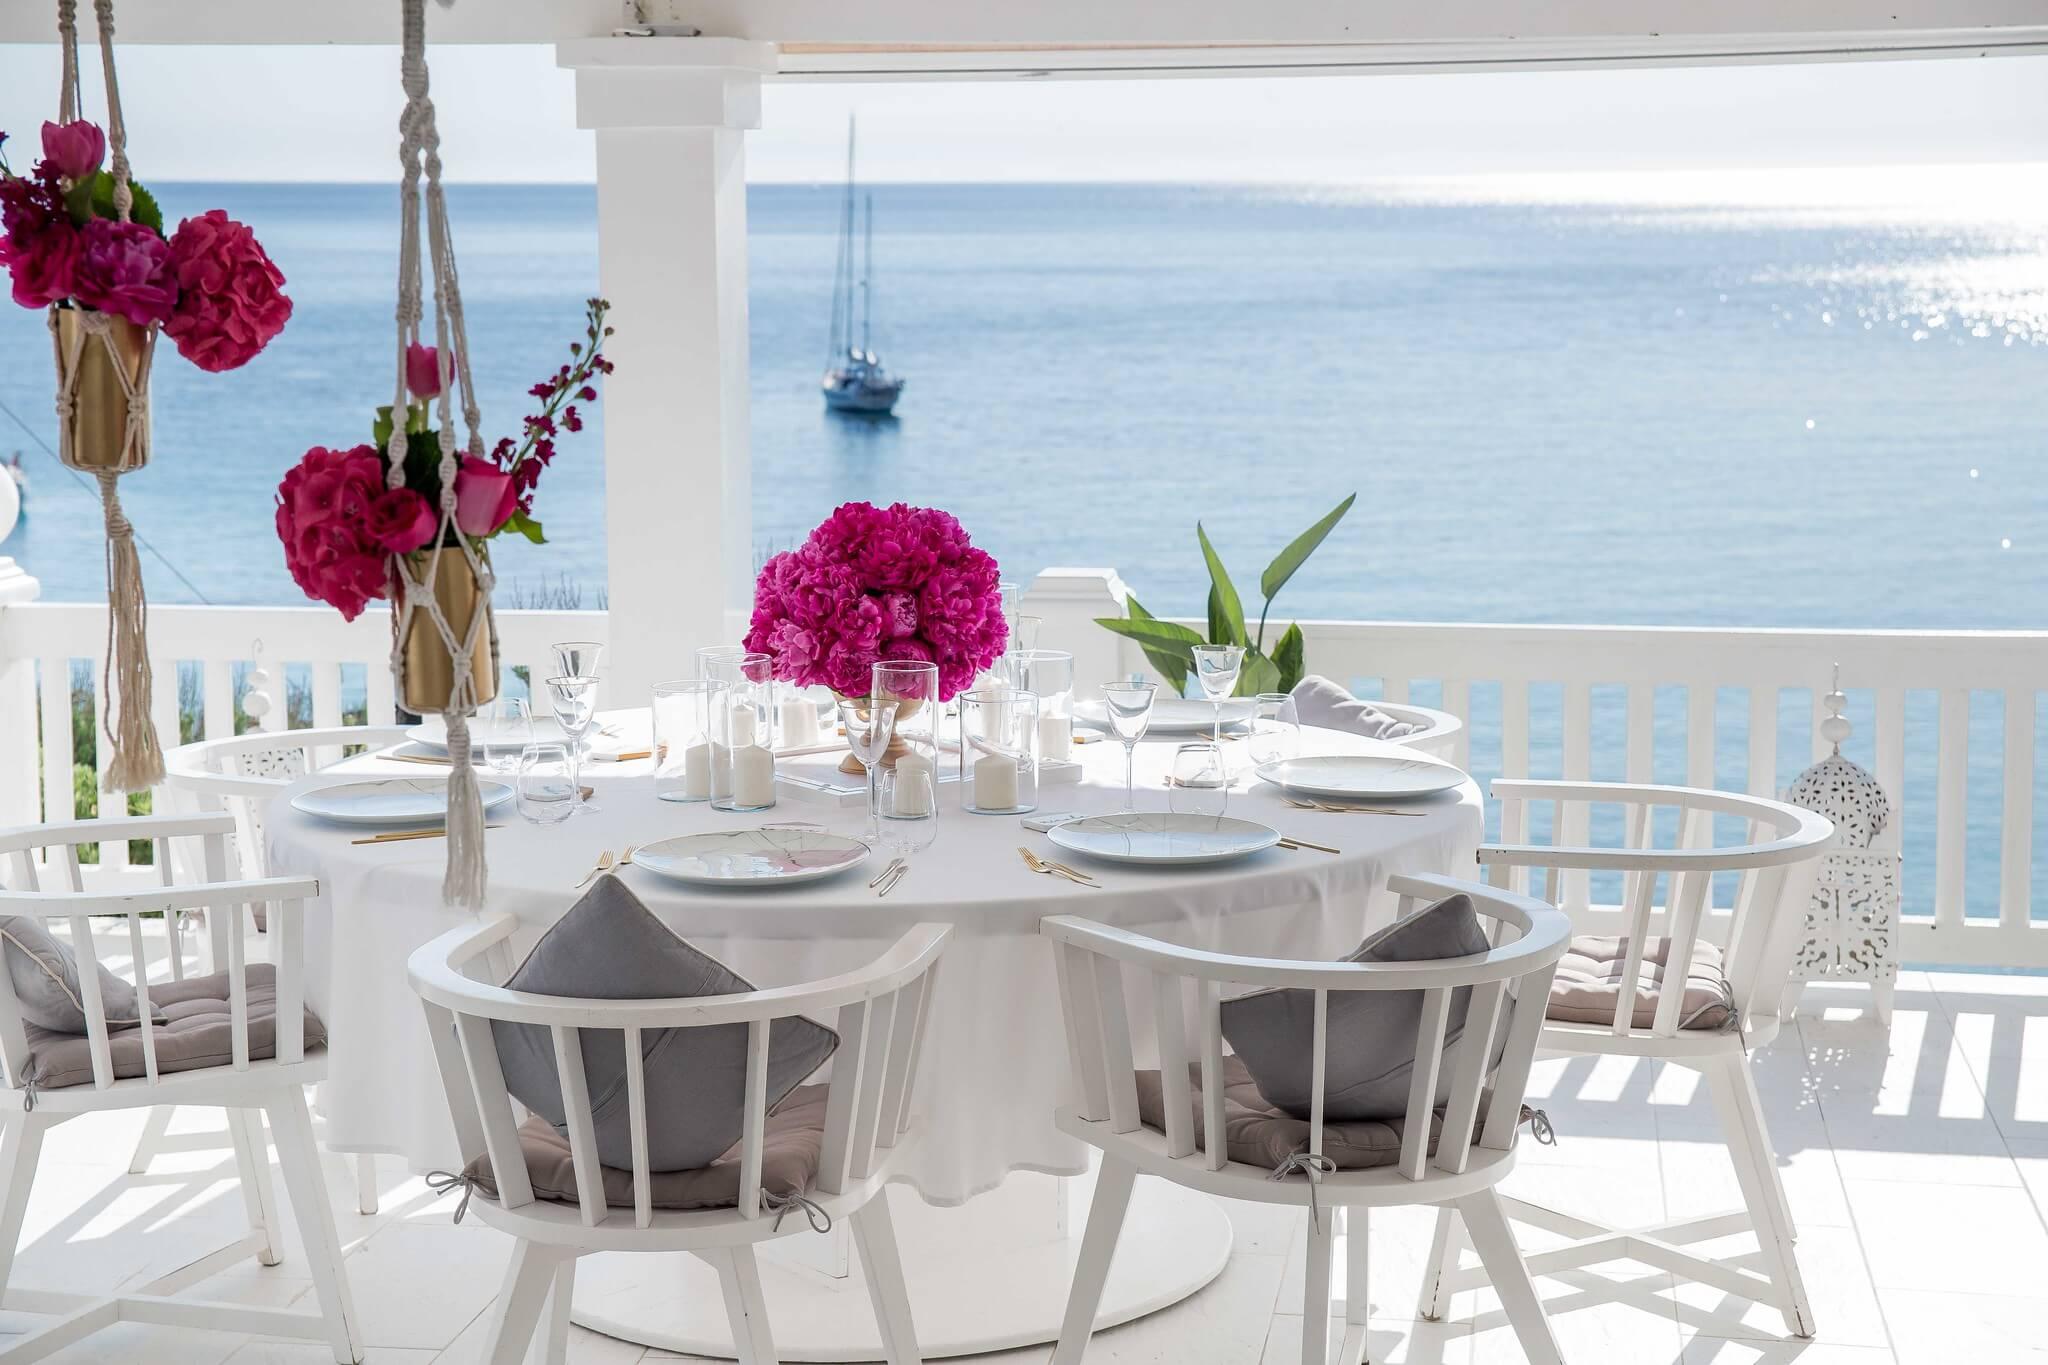 https://www.white-ibiza.com/wp-content/uploads/2020/03/ibiza-wedding-venues-cotton-beach-2020-03.jpg